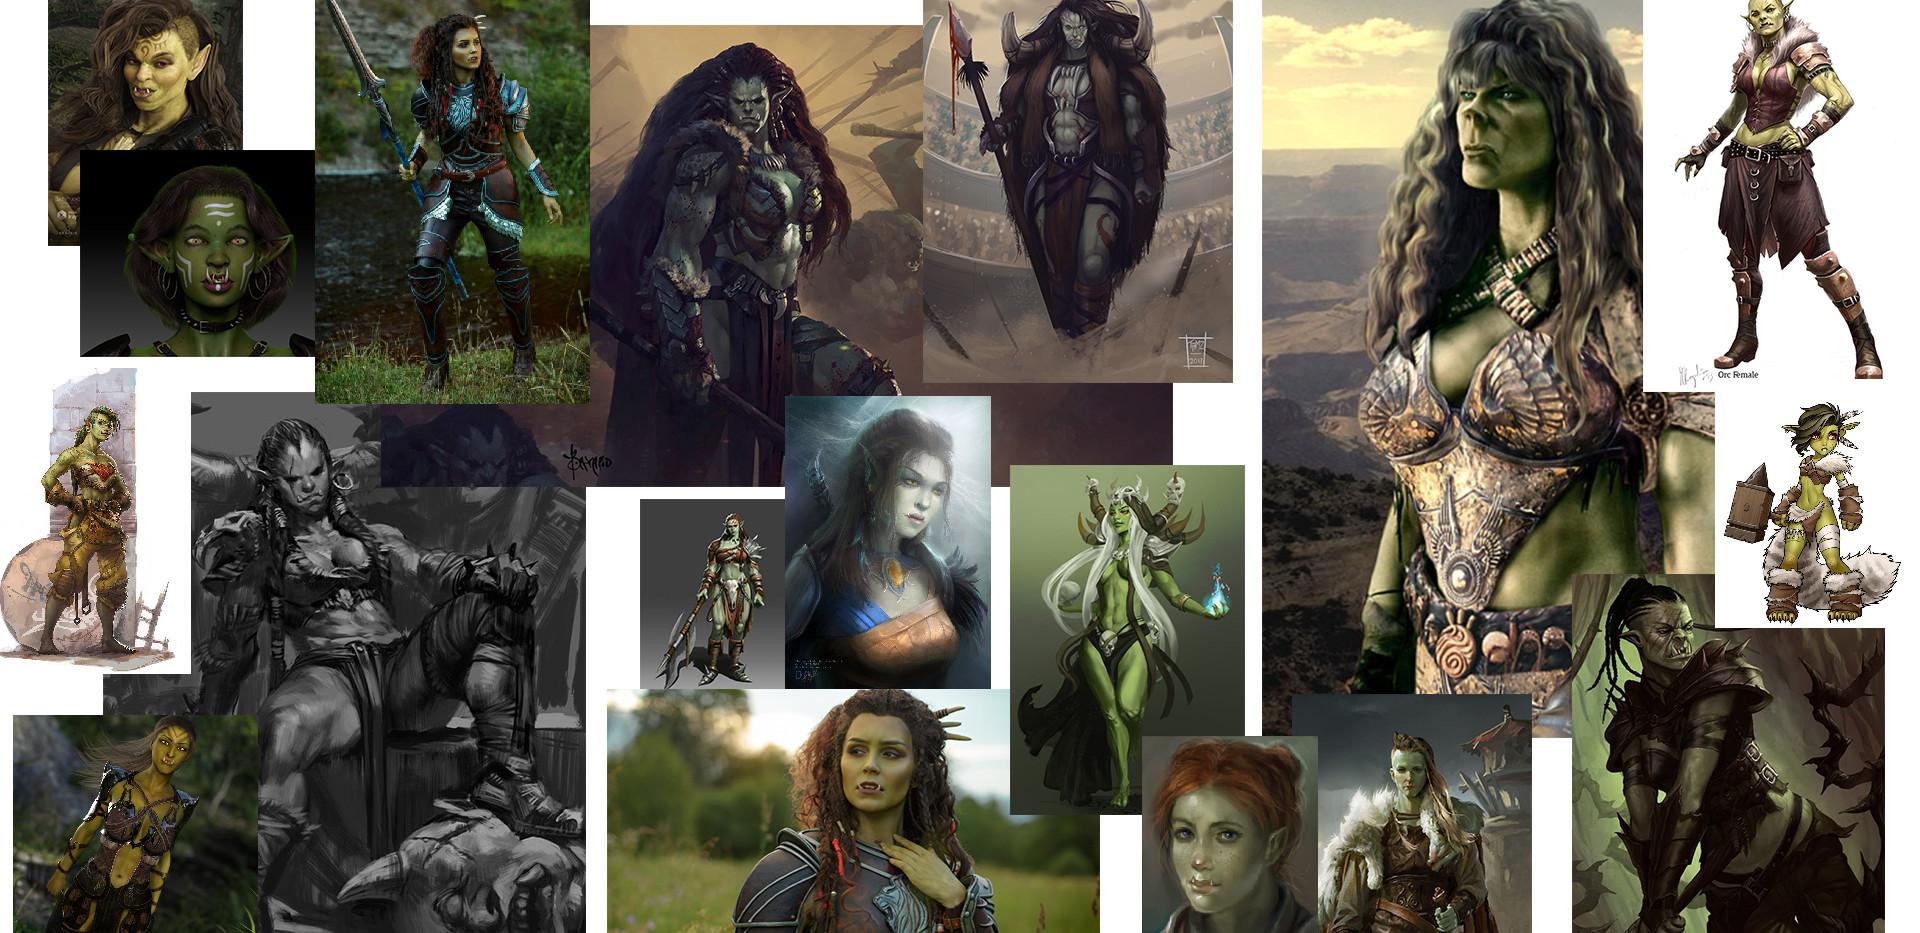 Half-Orc Concept